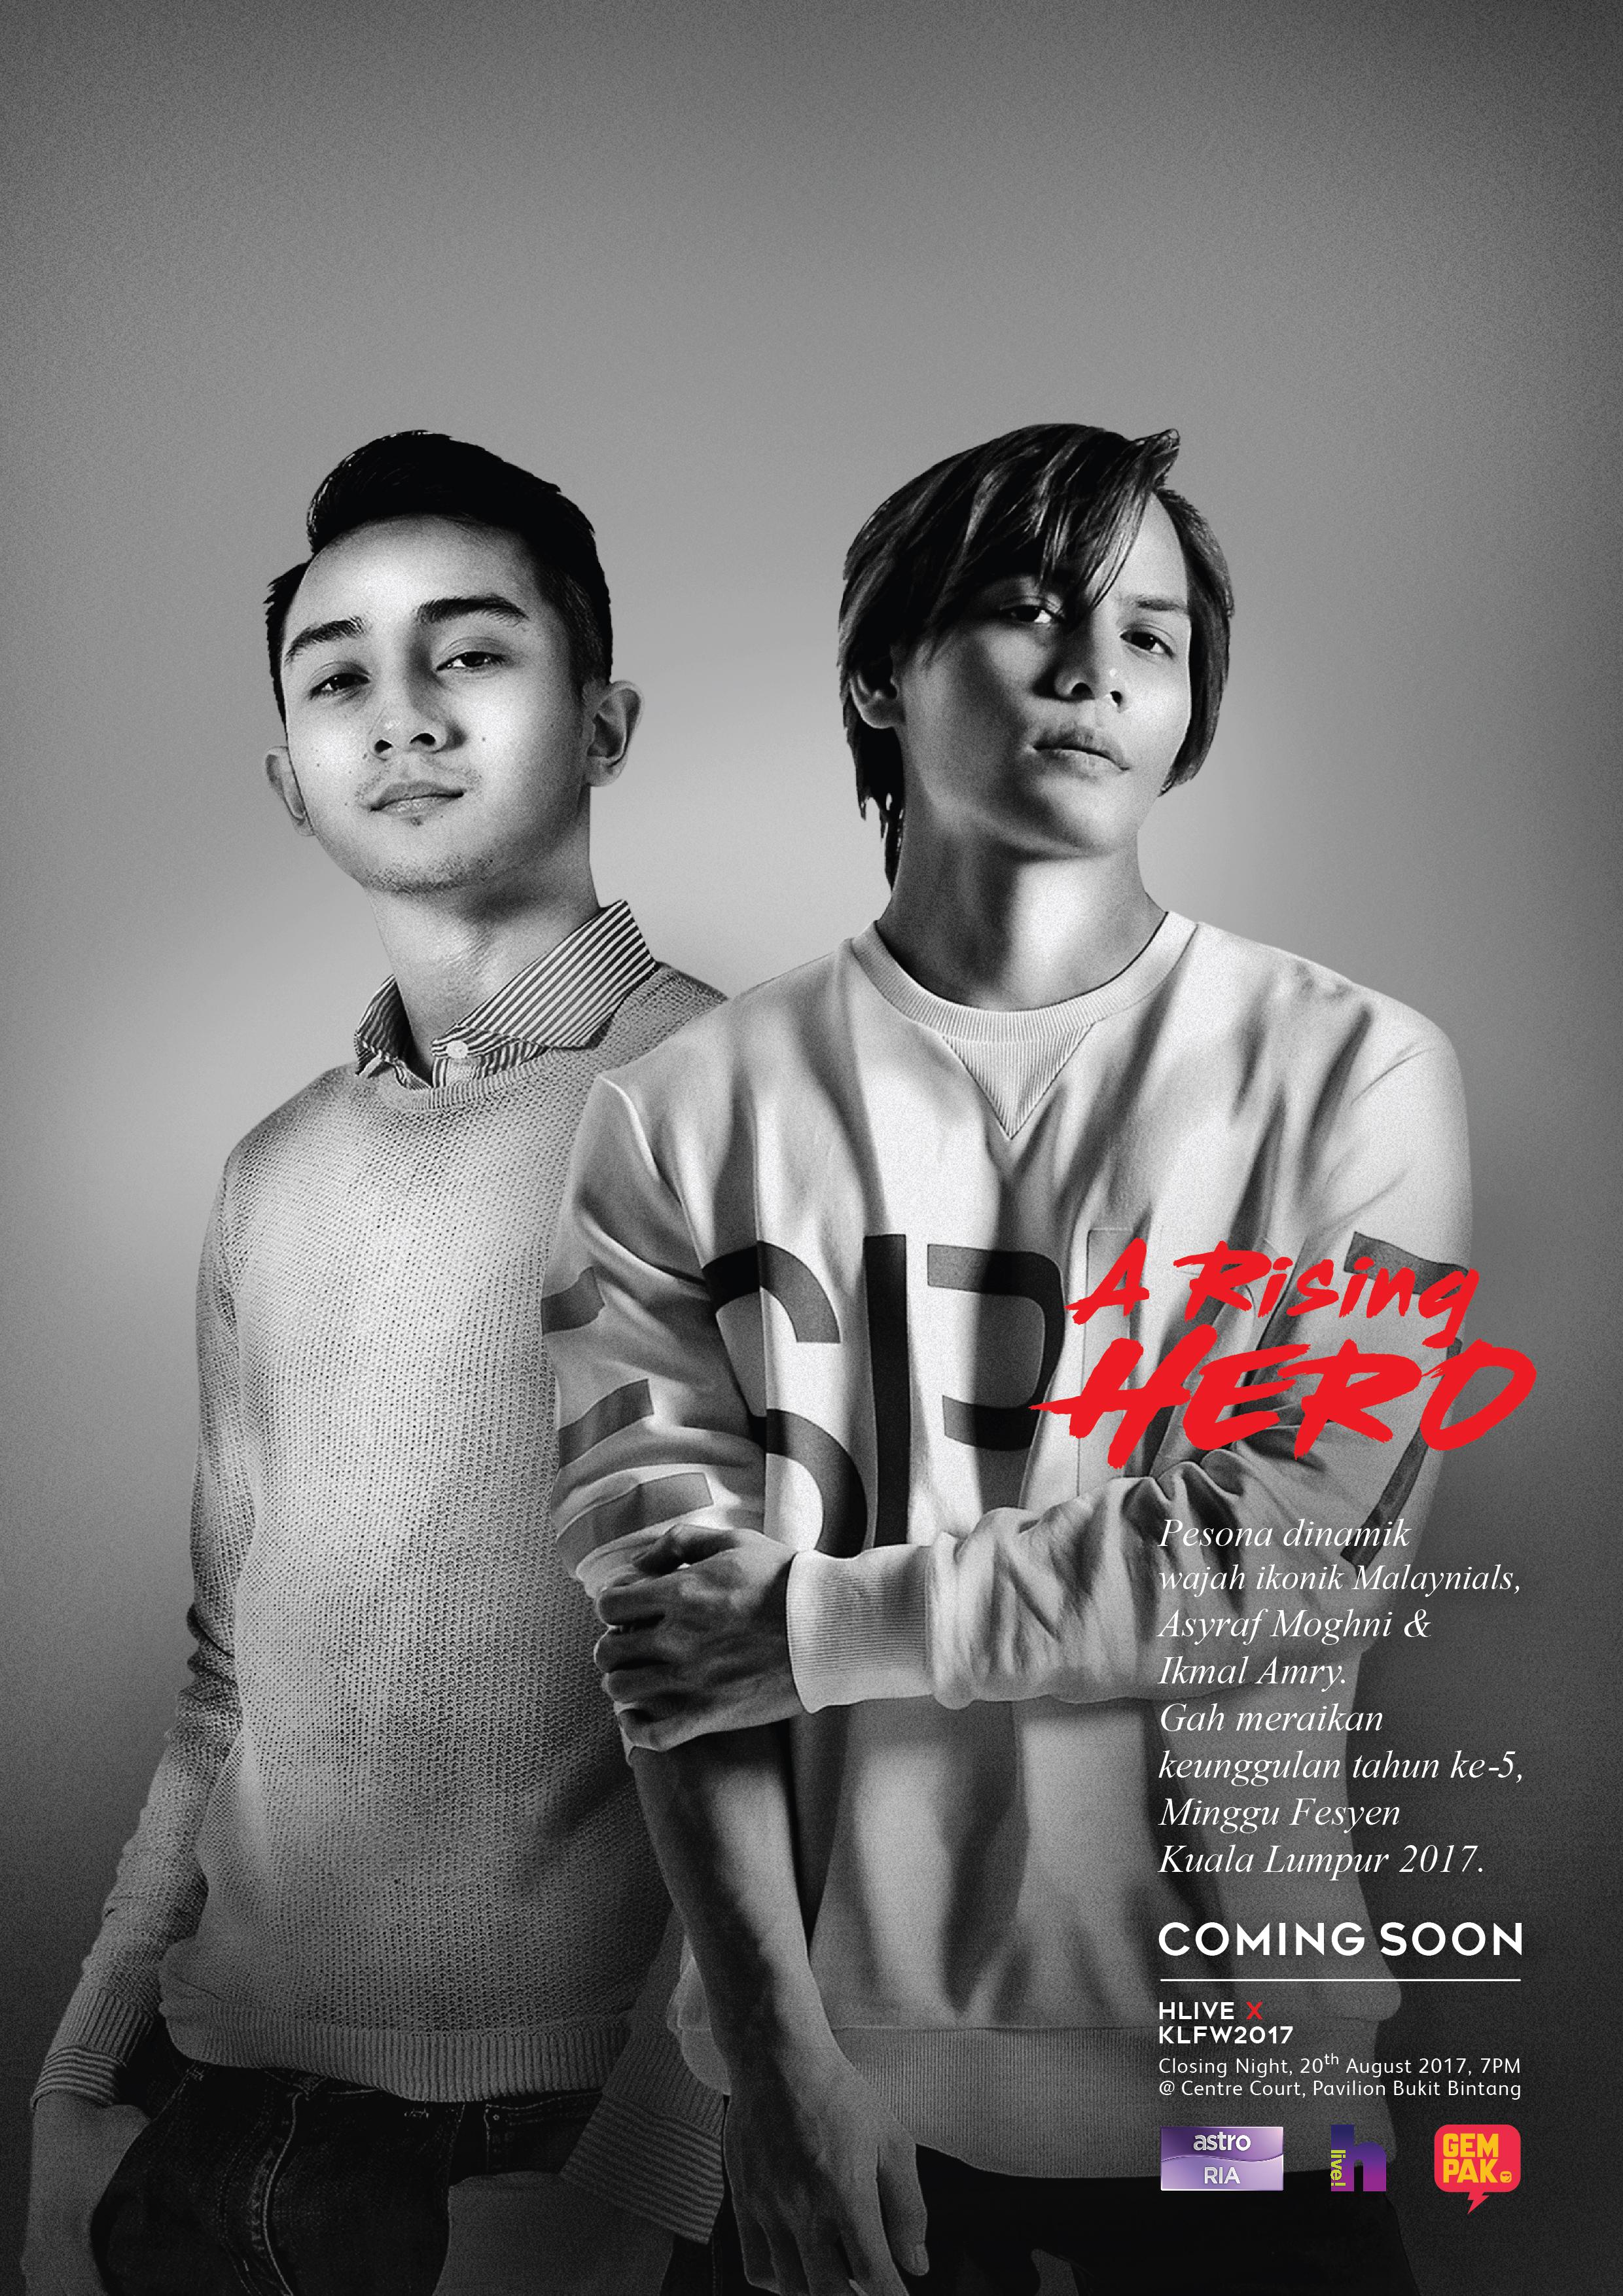 ASR1303820 H-Live Magazine Ad_EN ver.jpg